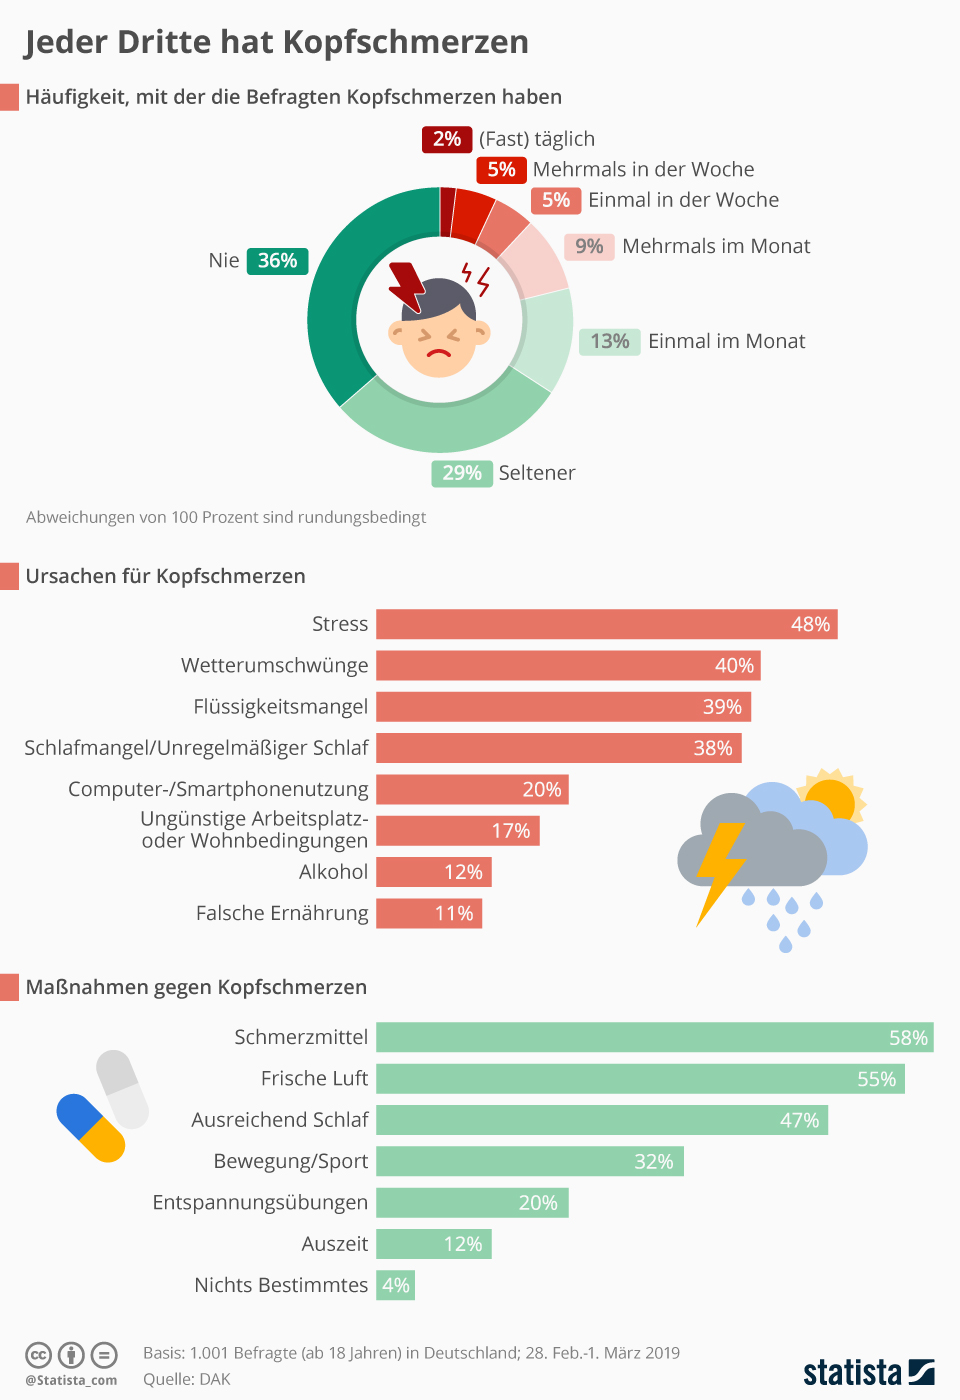 https://de.statista.com/infografik/18580/kopfschmerzen-umfrage/